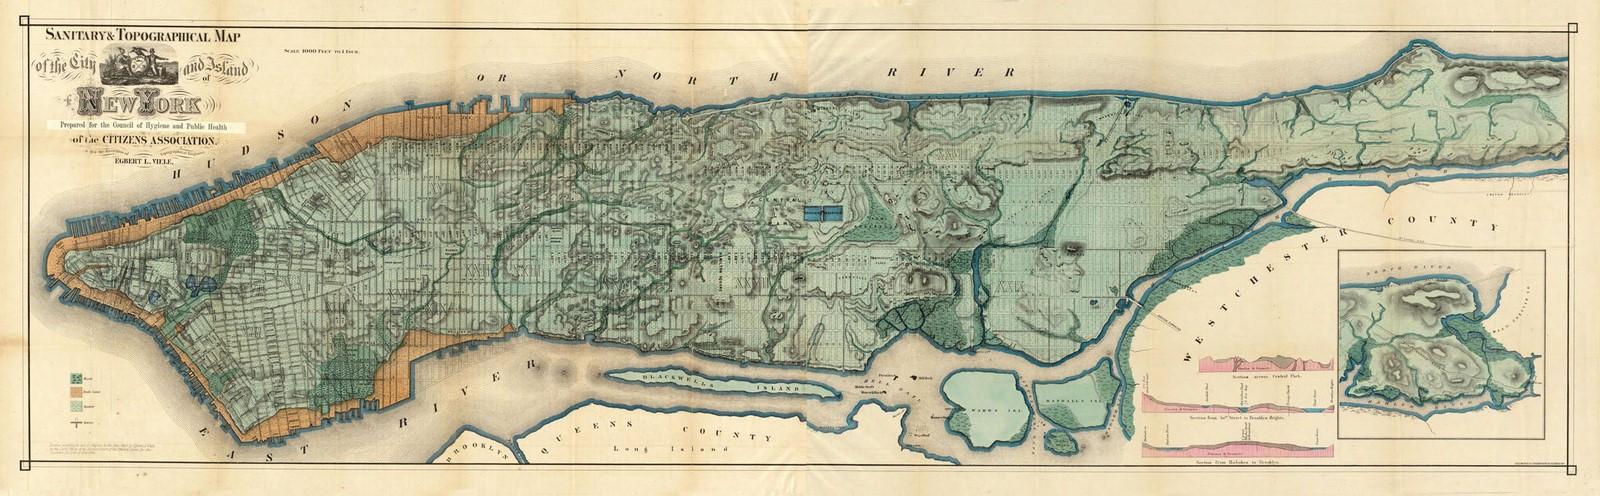 The Greatest Grid - Manhattan - Sheet5